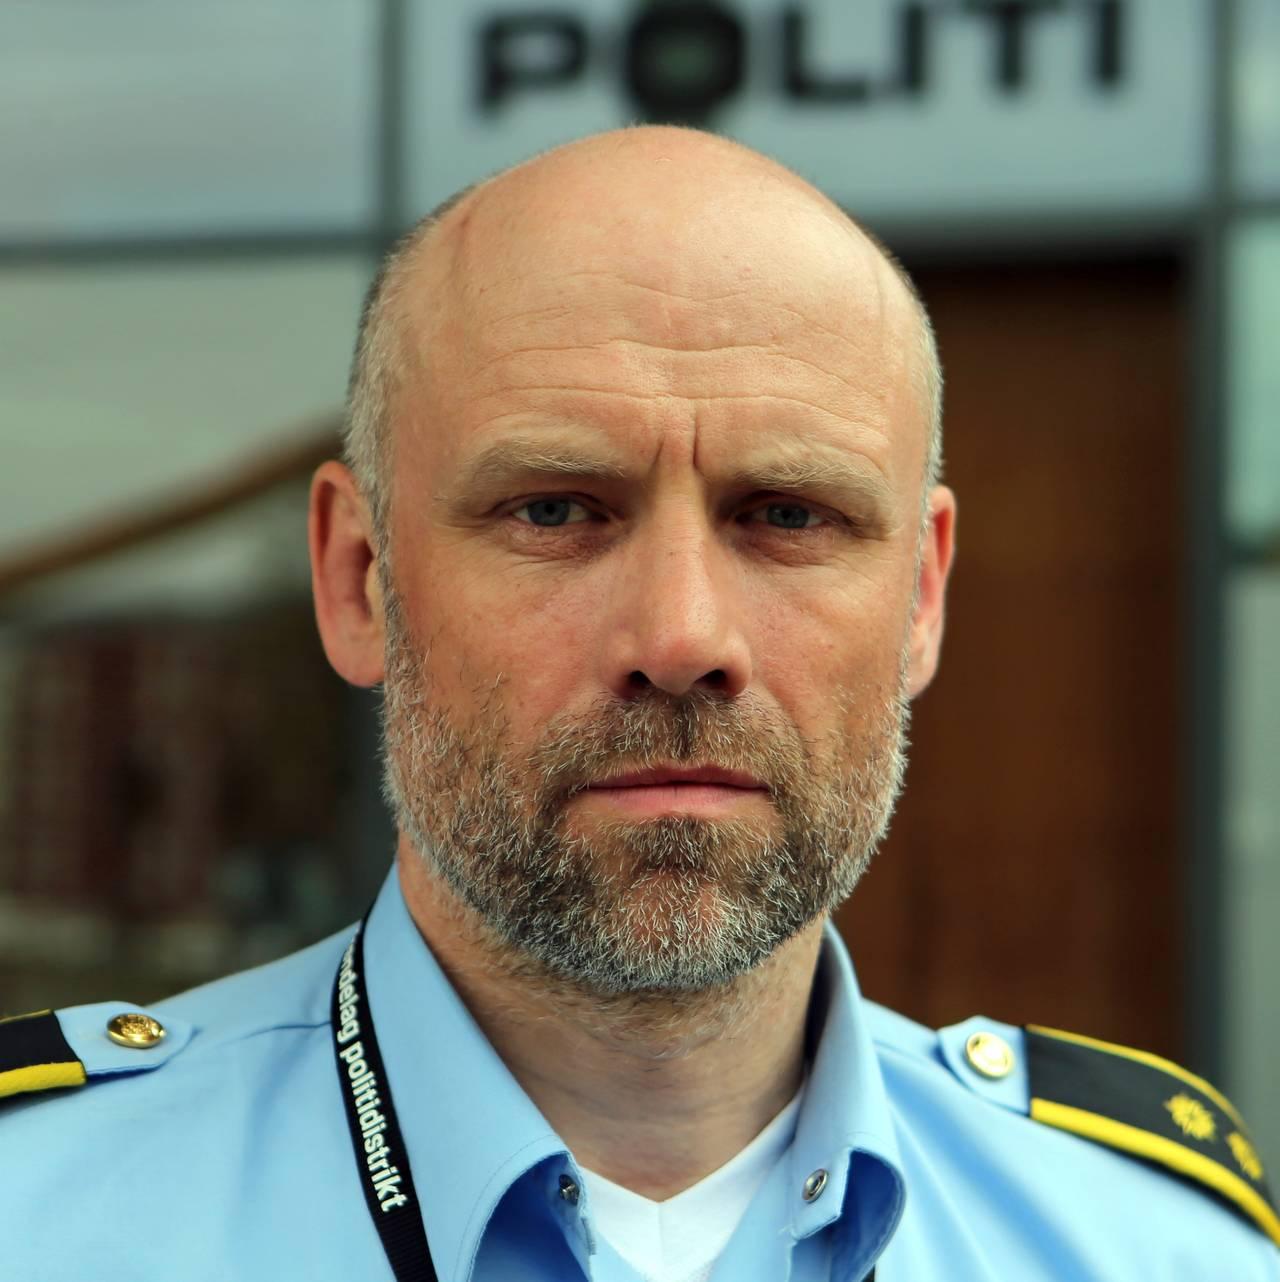 Torgeir Moholt